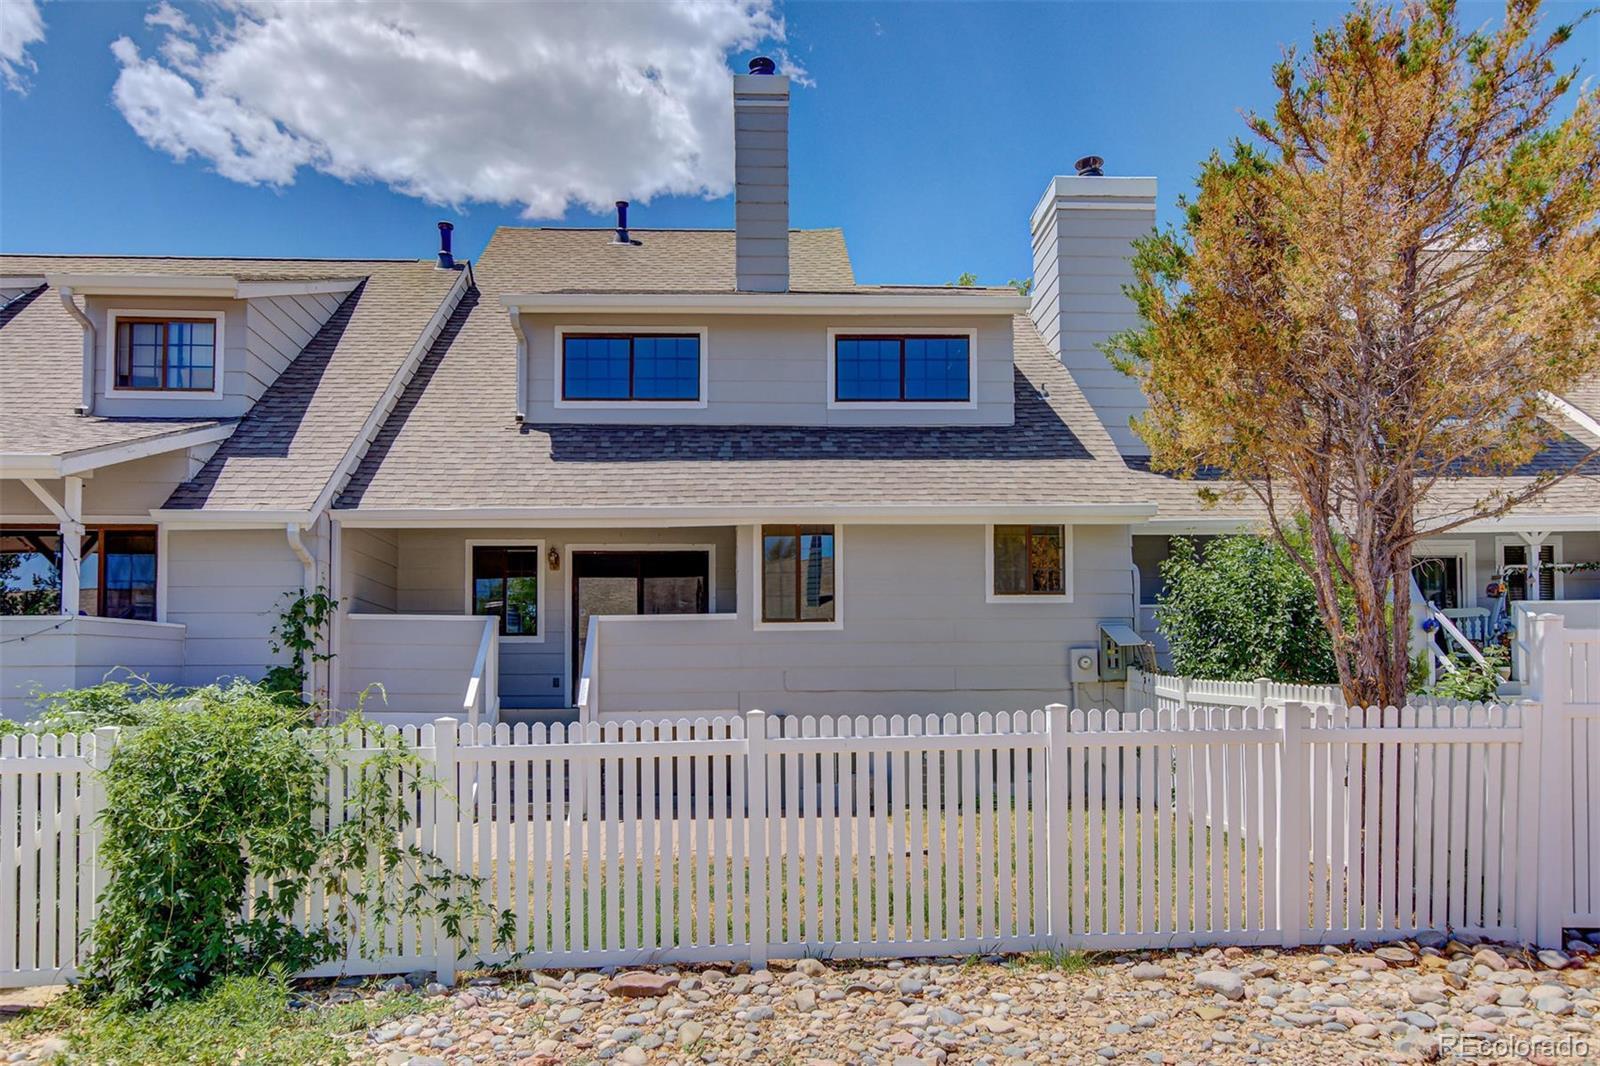 10460 W Purgatoire Peak Property Photo - Littleton, CO real estate listing